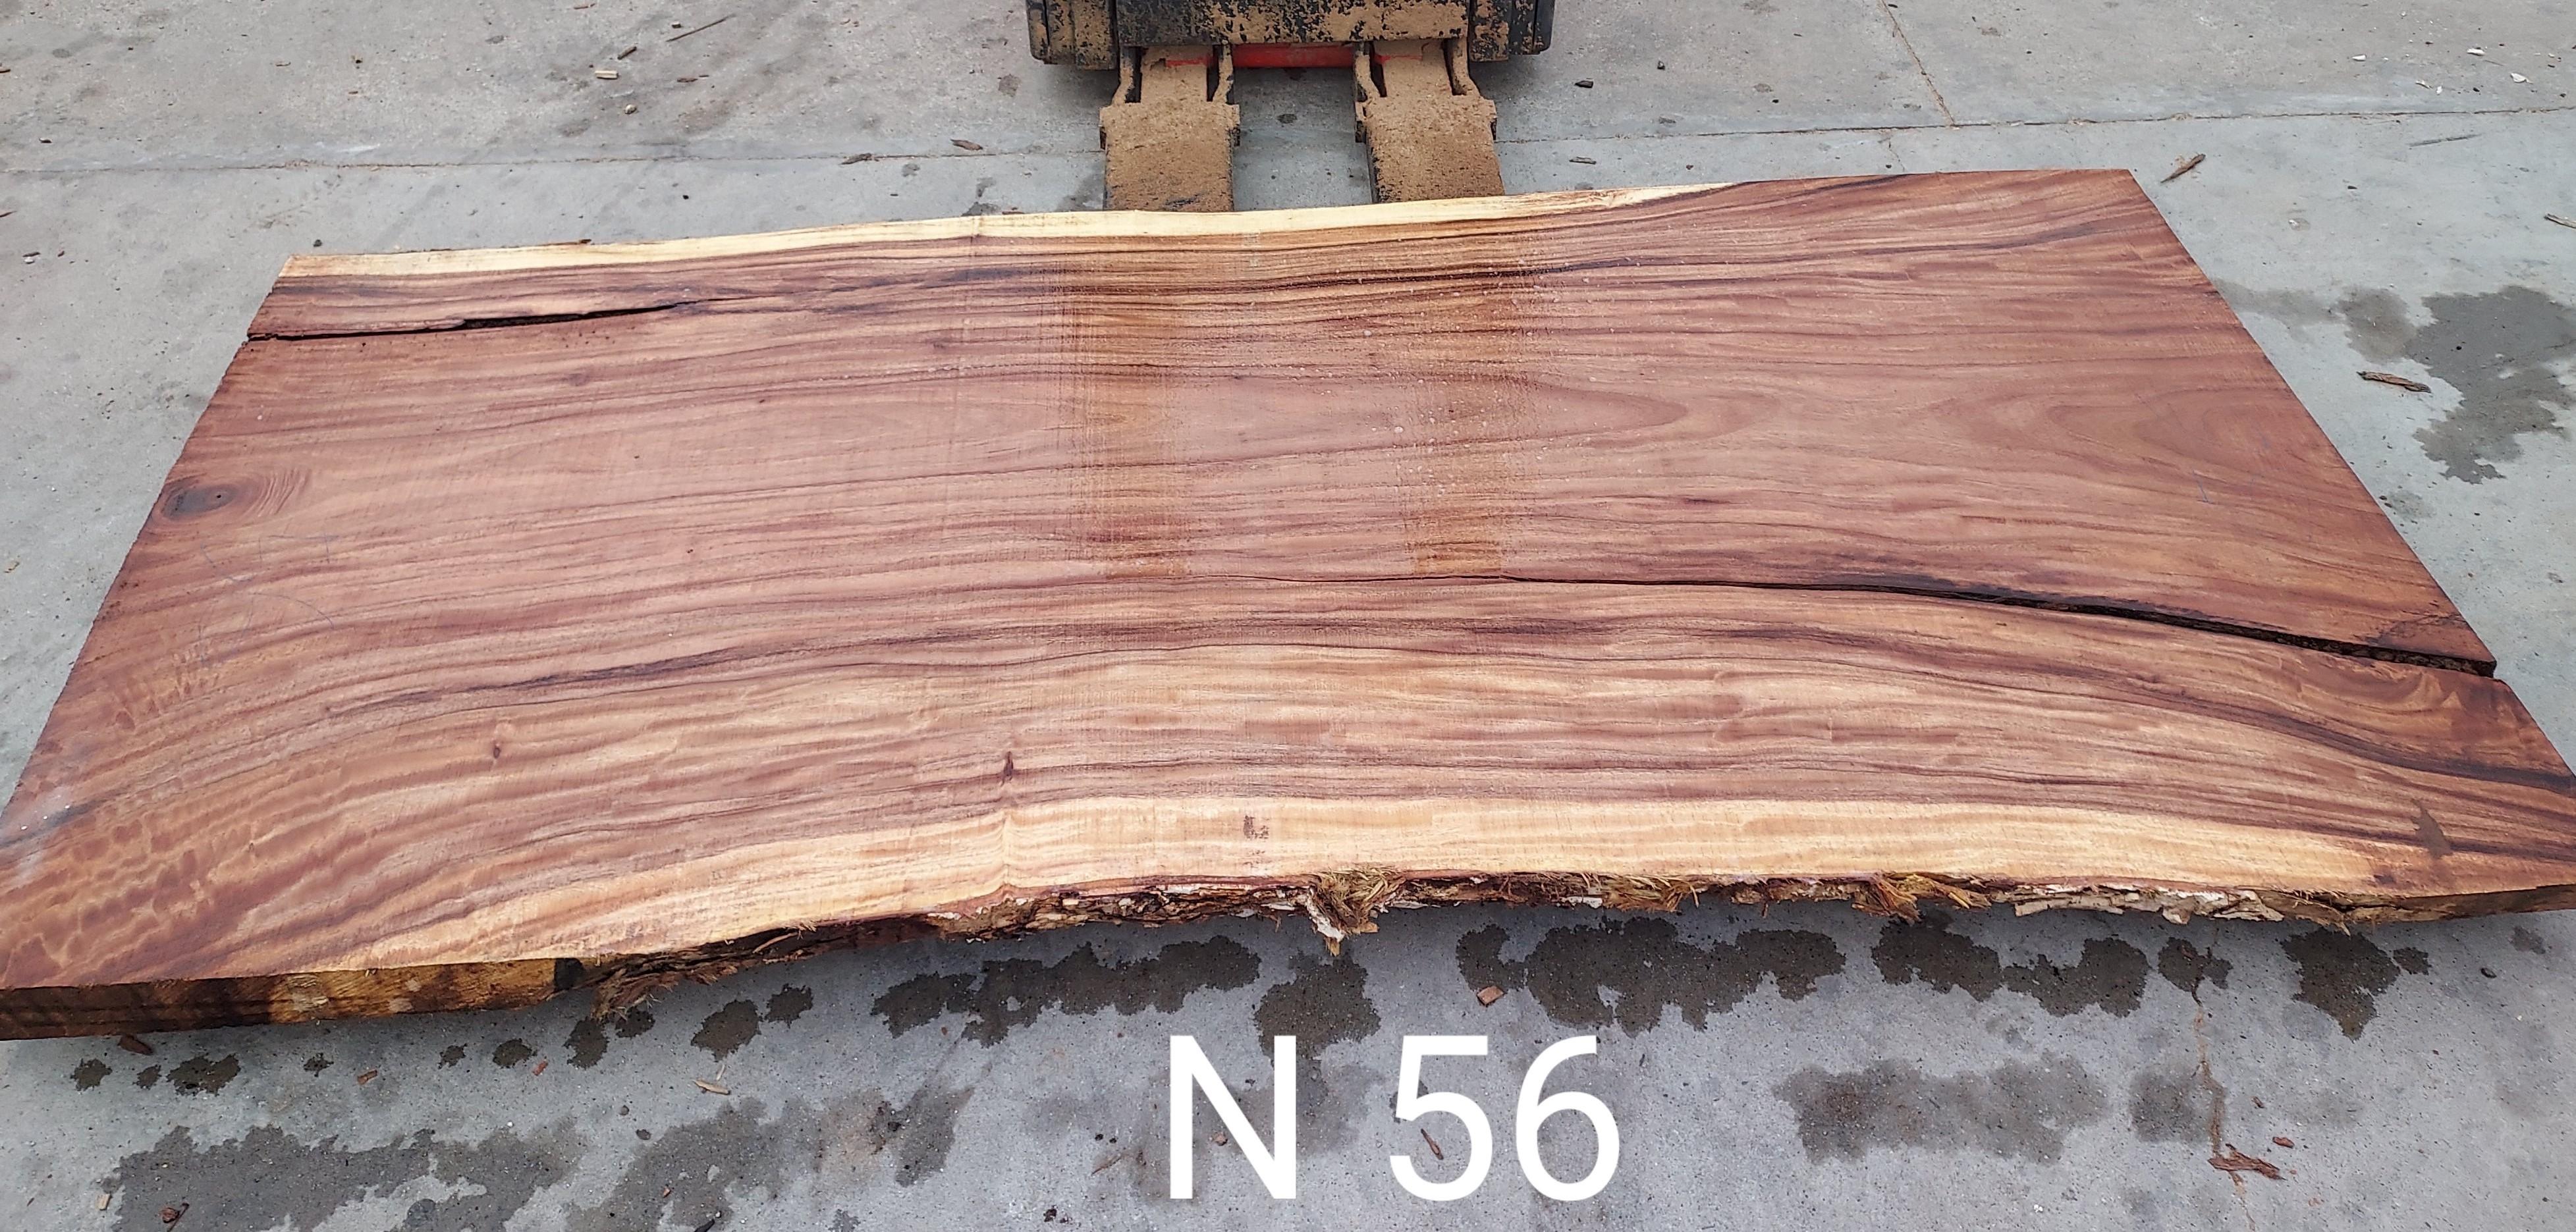 N 56 ANCHO